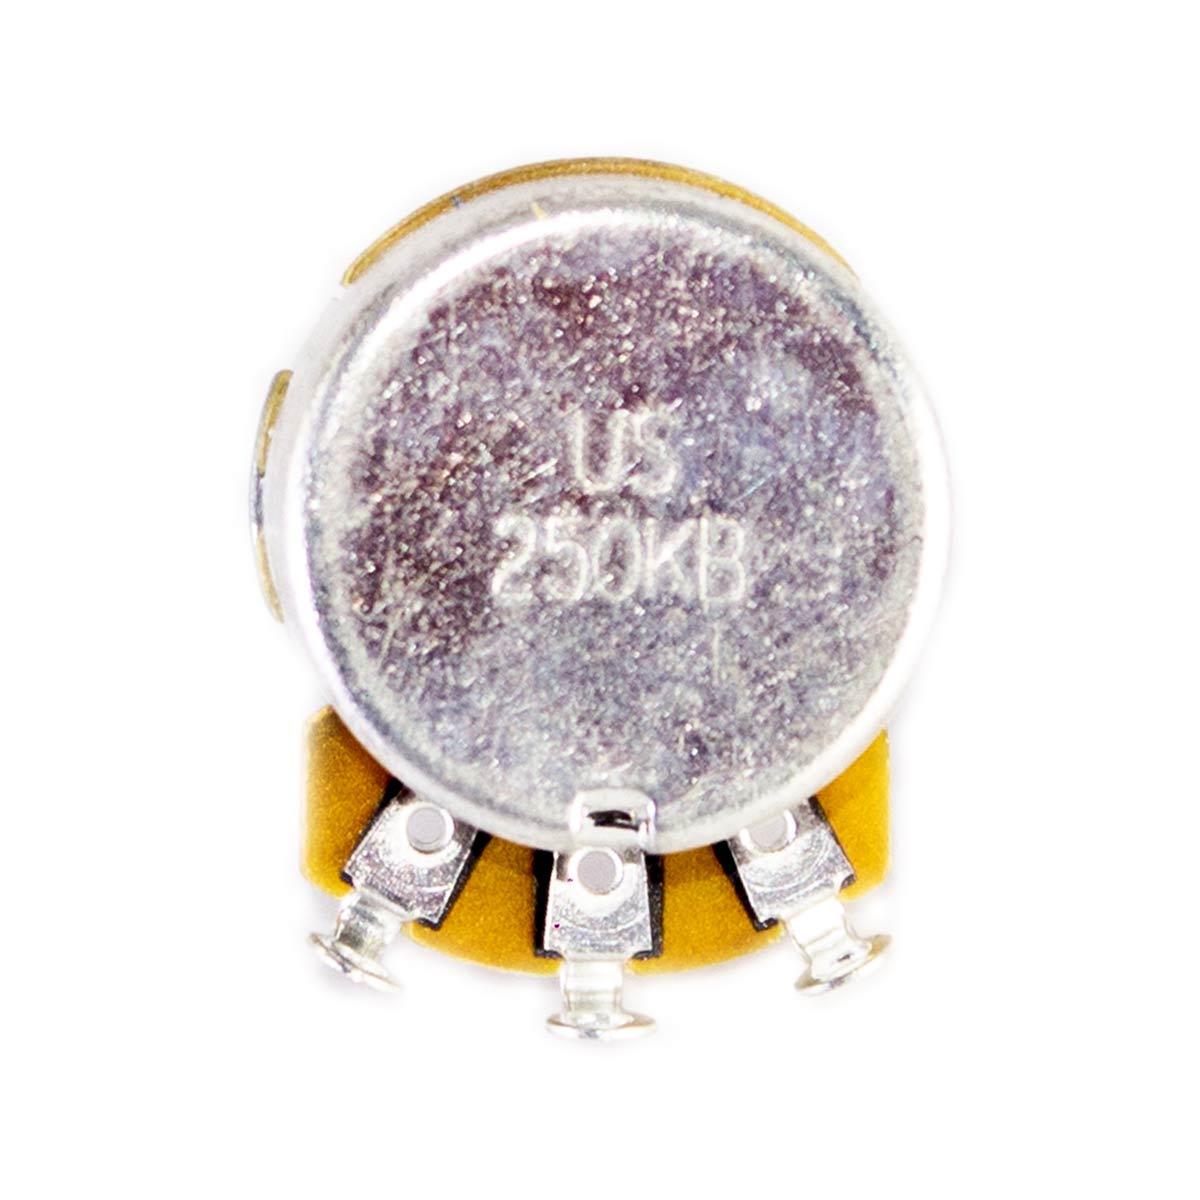 Potenciômetro Spirit B250k Base Grande Eixo Longo